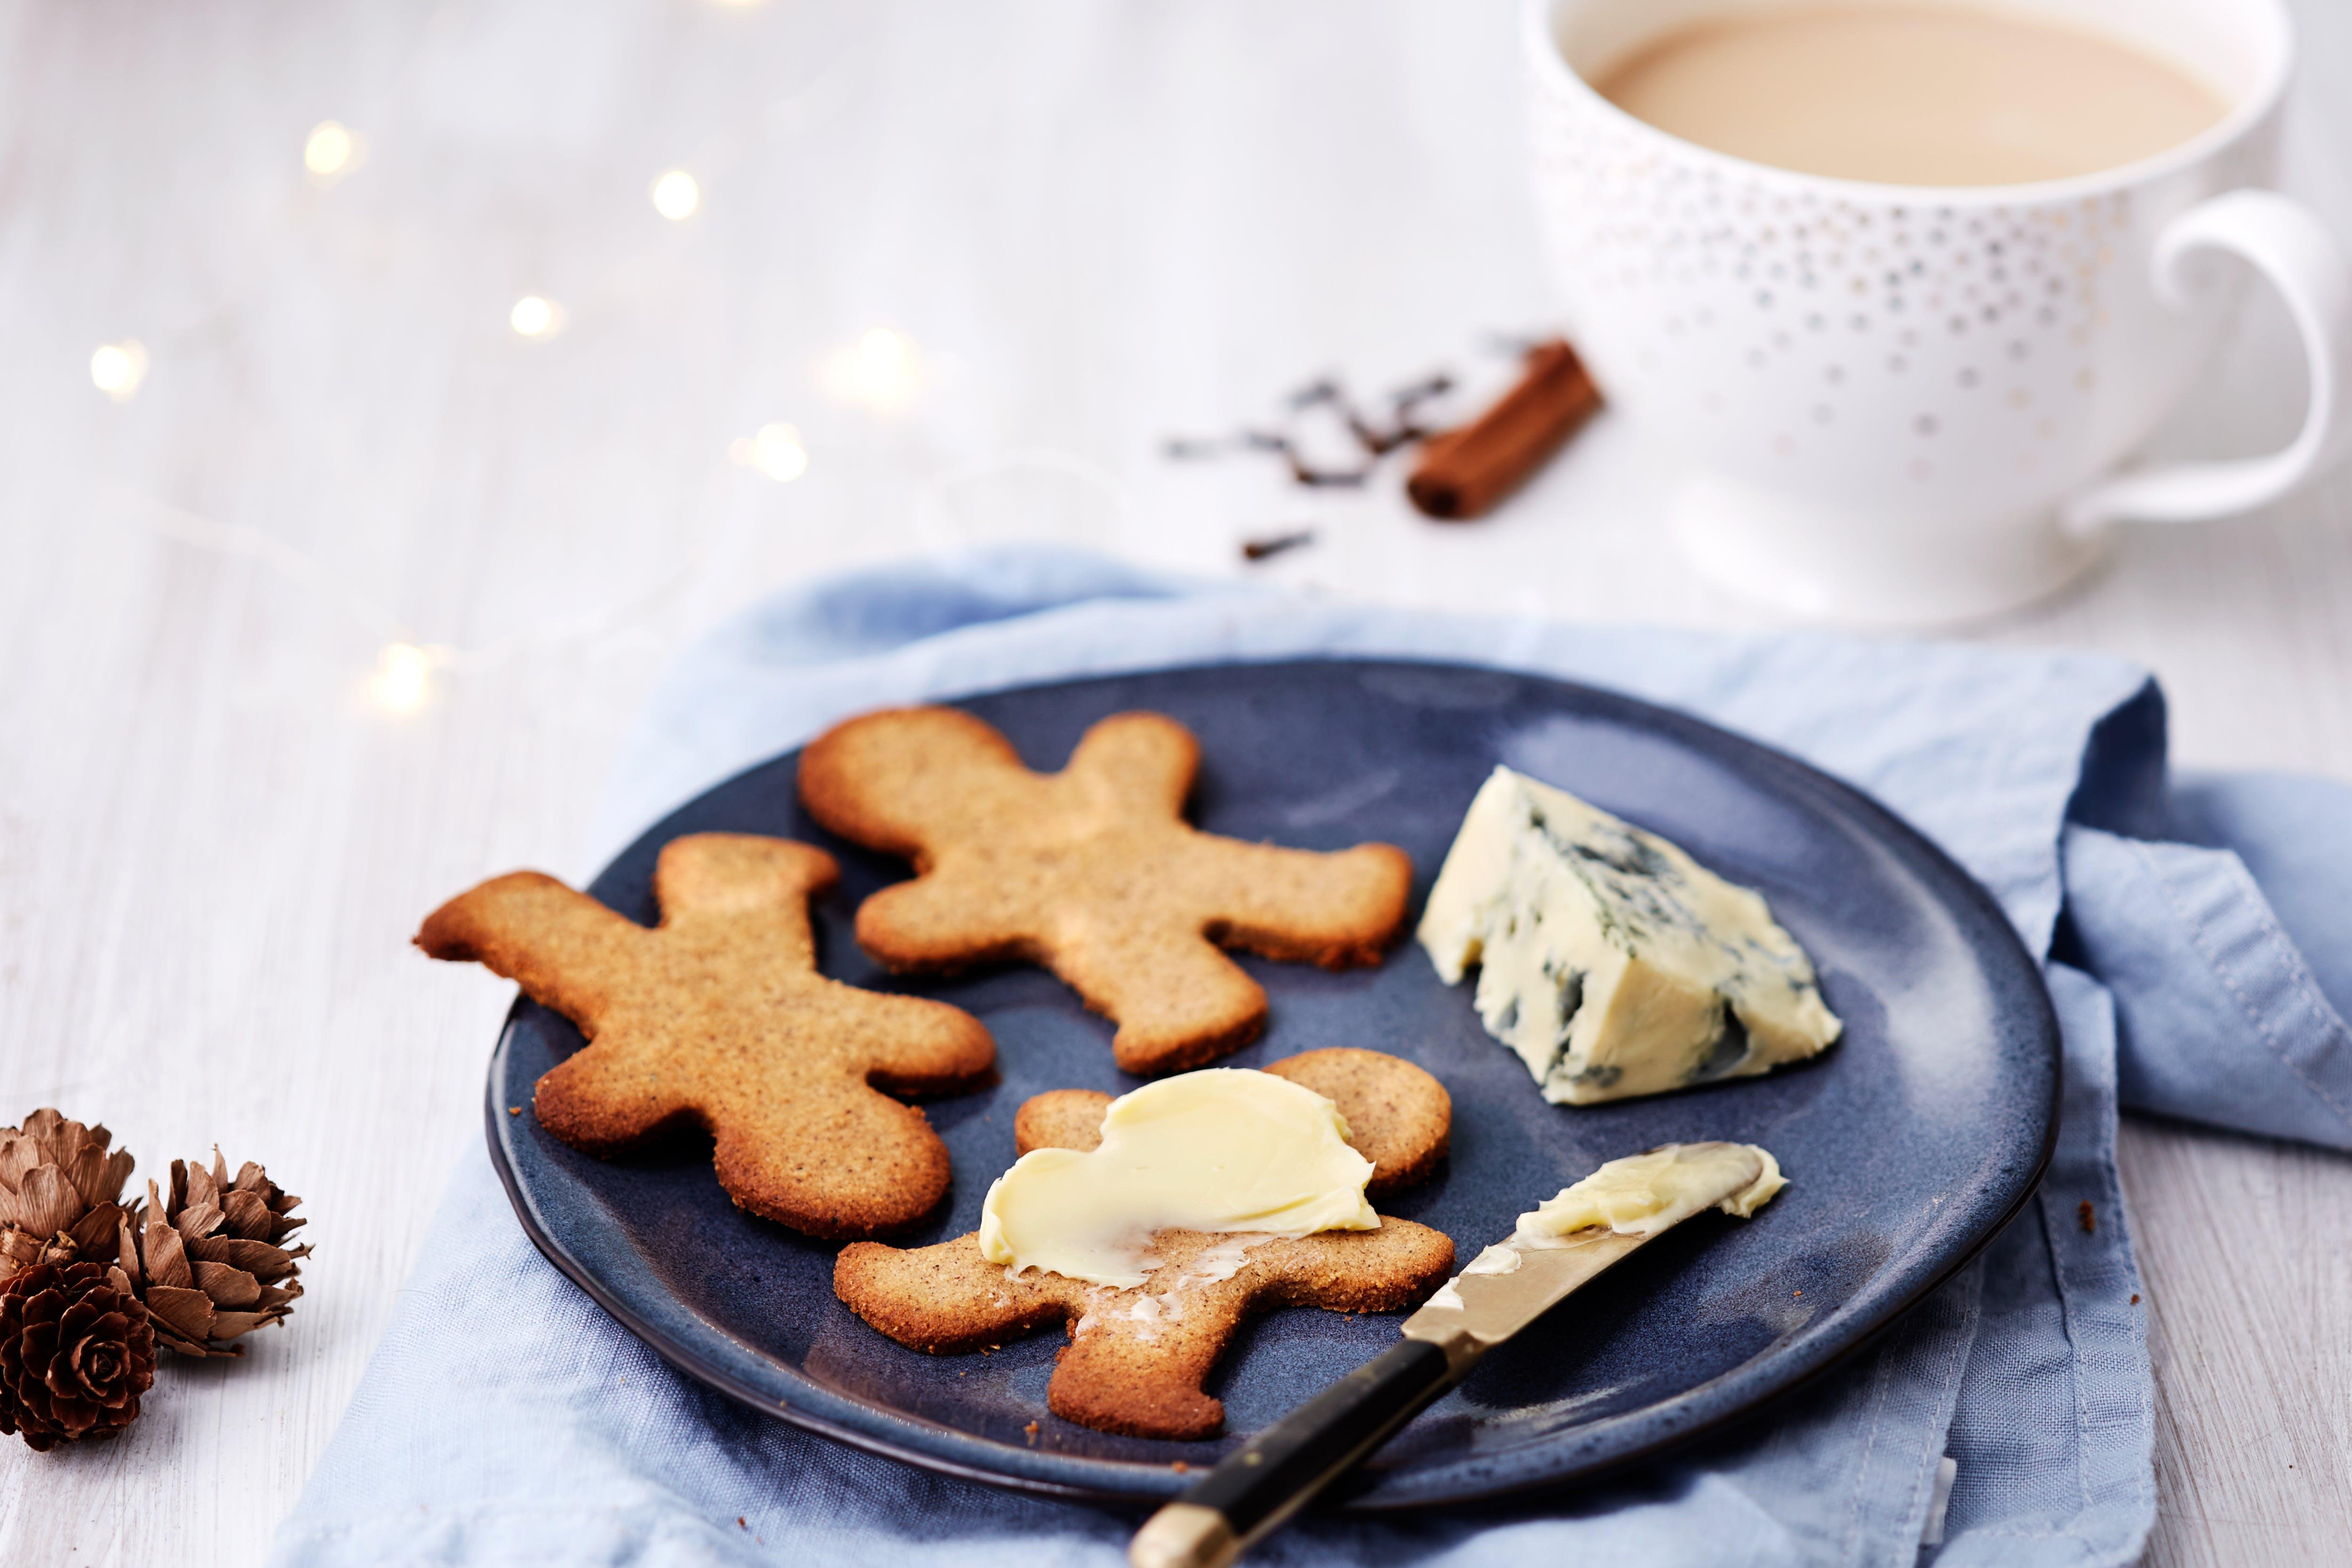 Low-carb gingerbread cookies